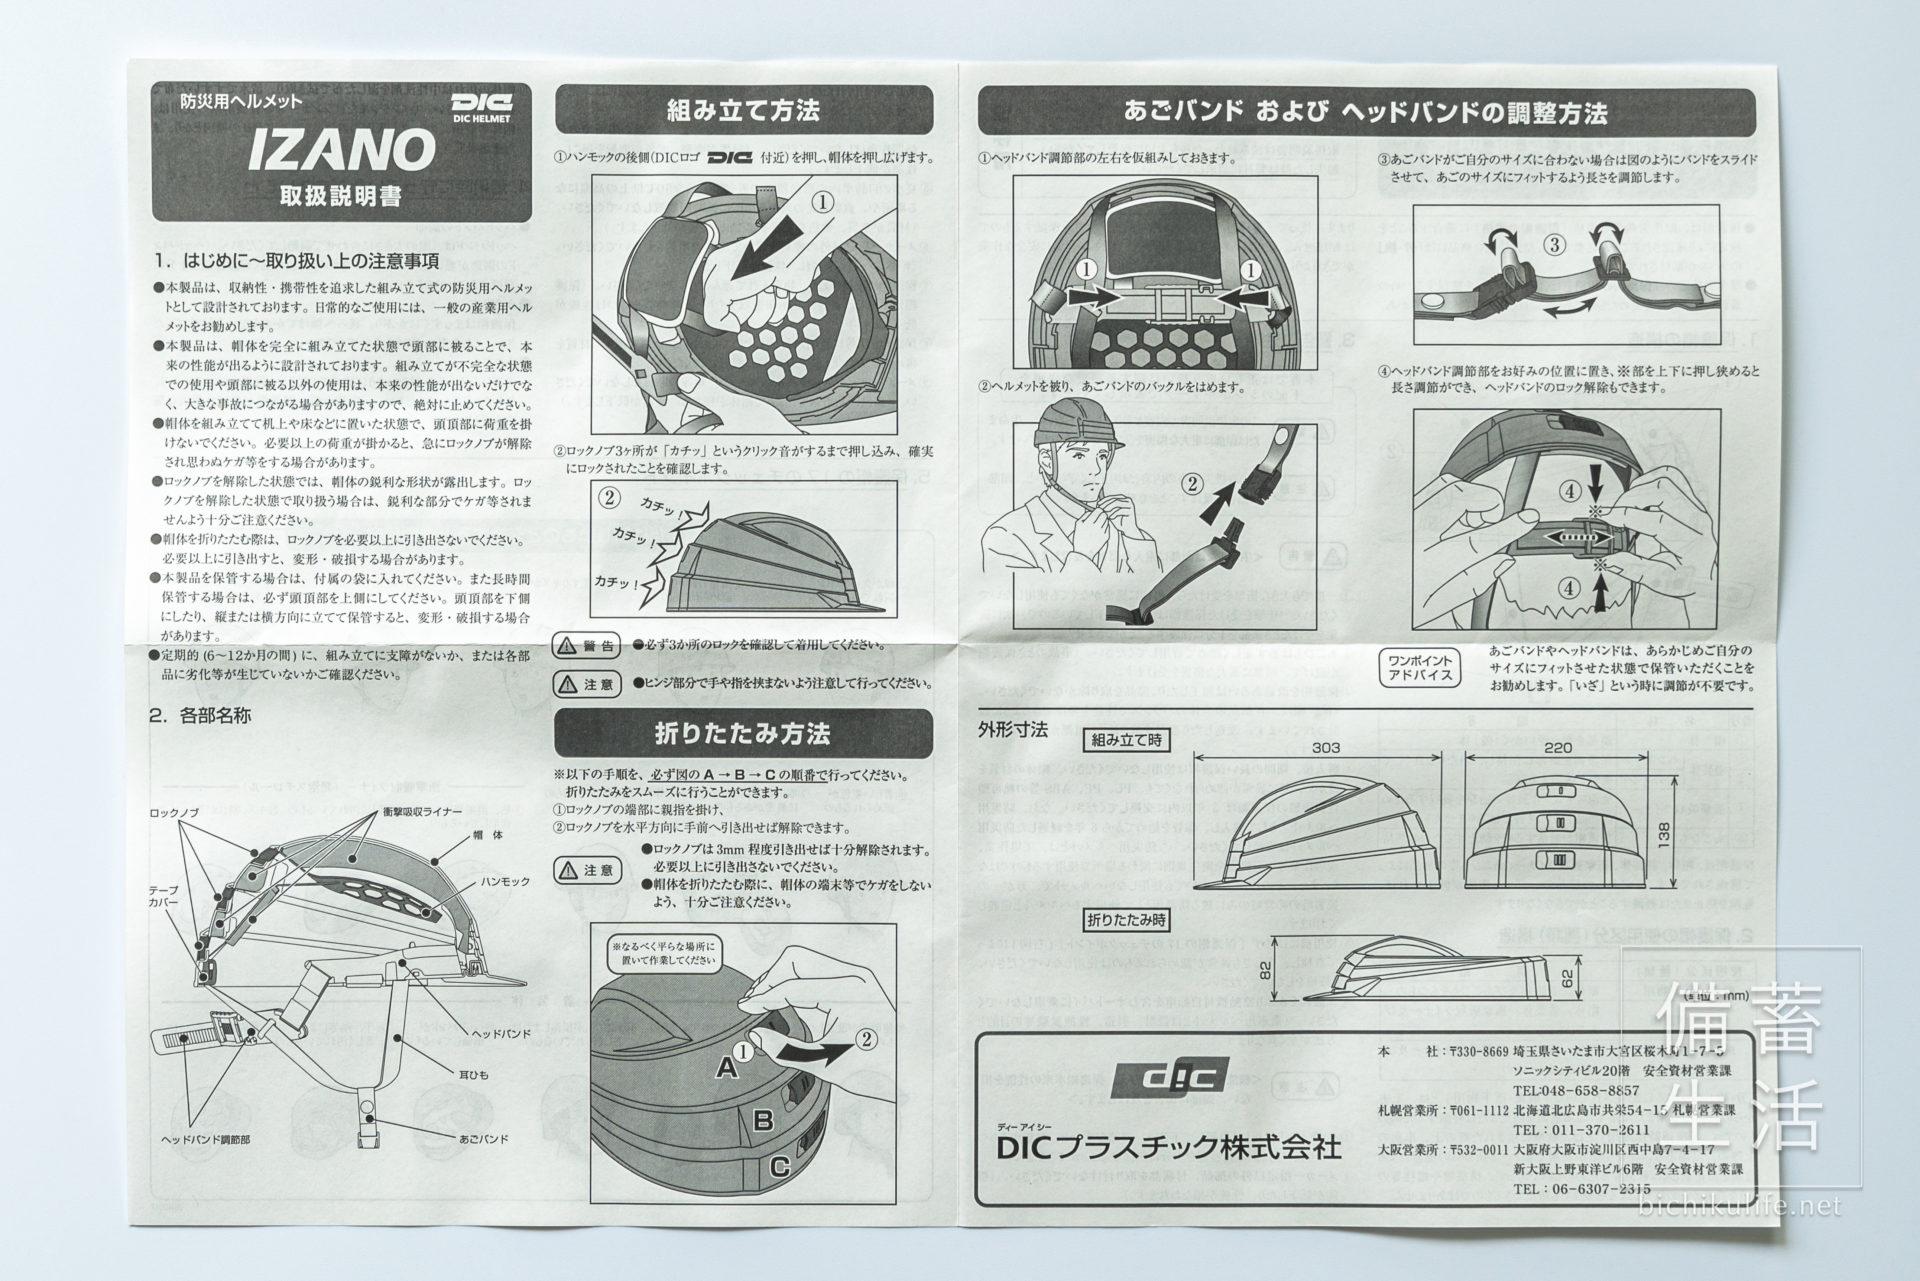 IZANO 防災用 たためるヘルメット 取扱説明書